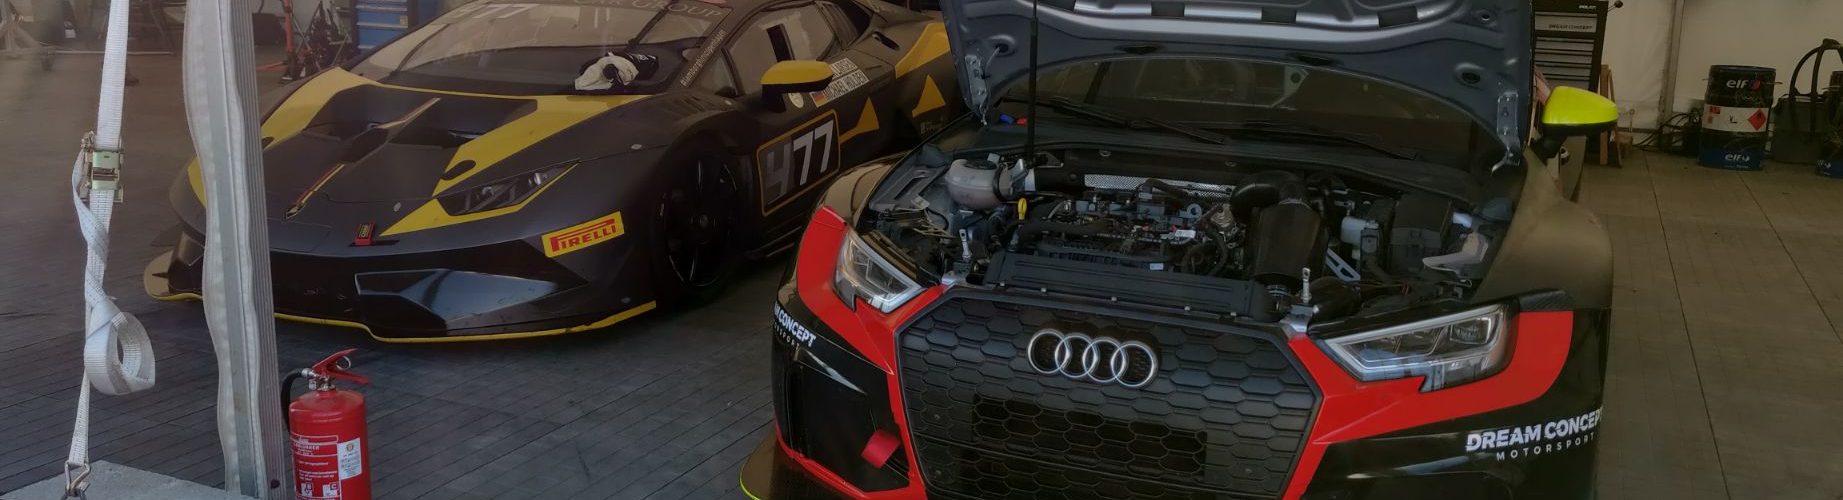 Dream Concept Motorsport